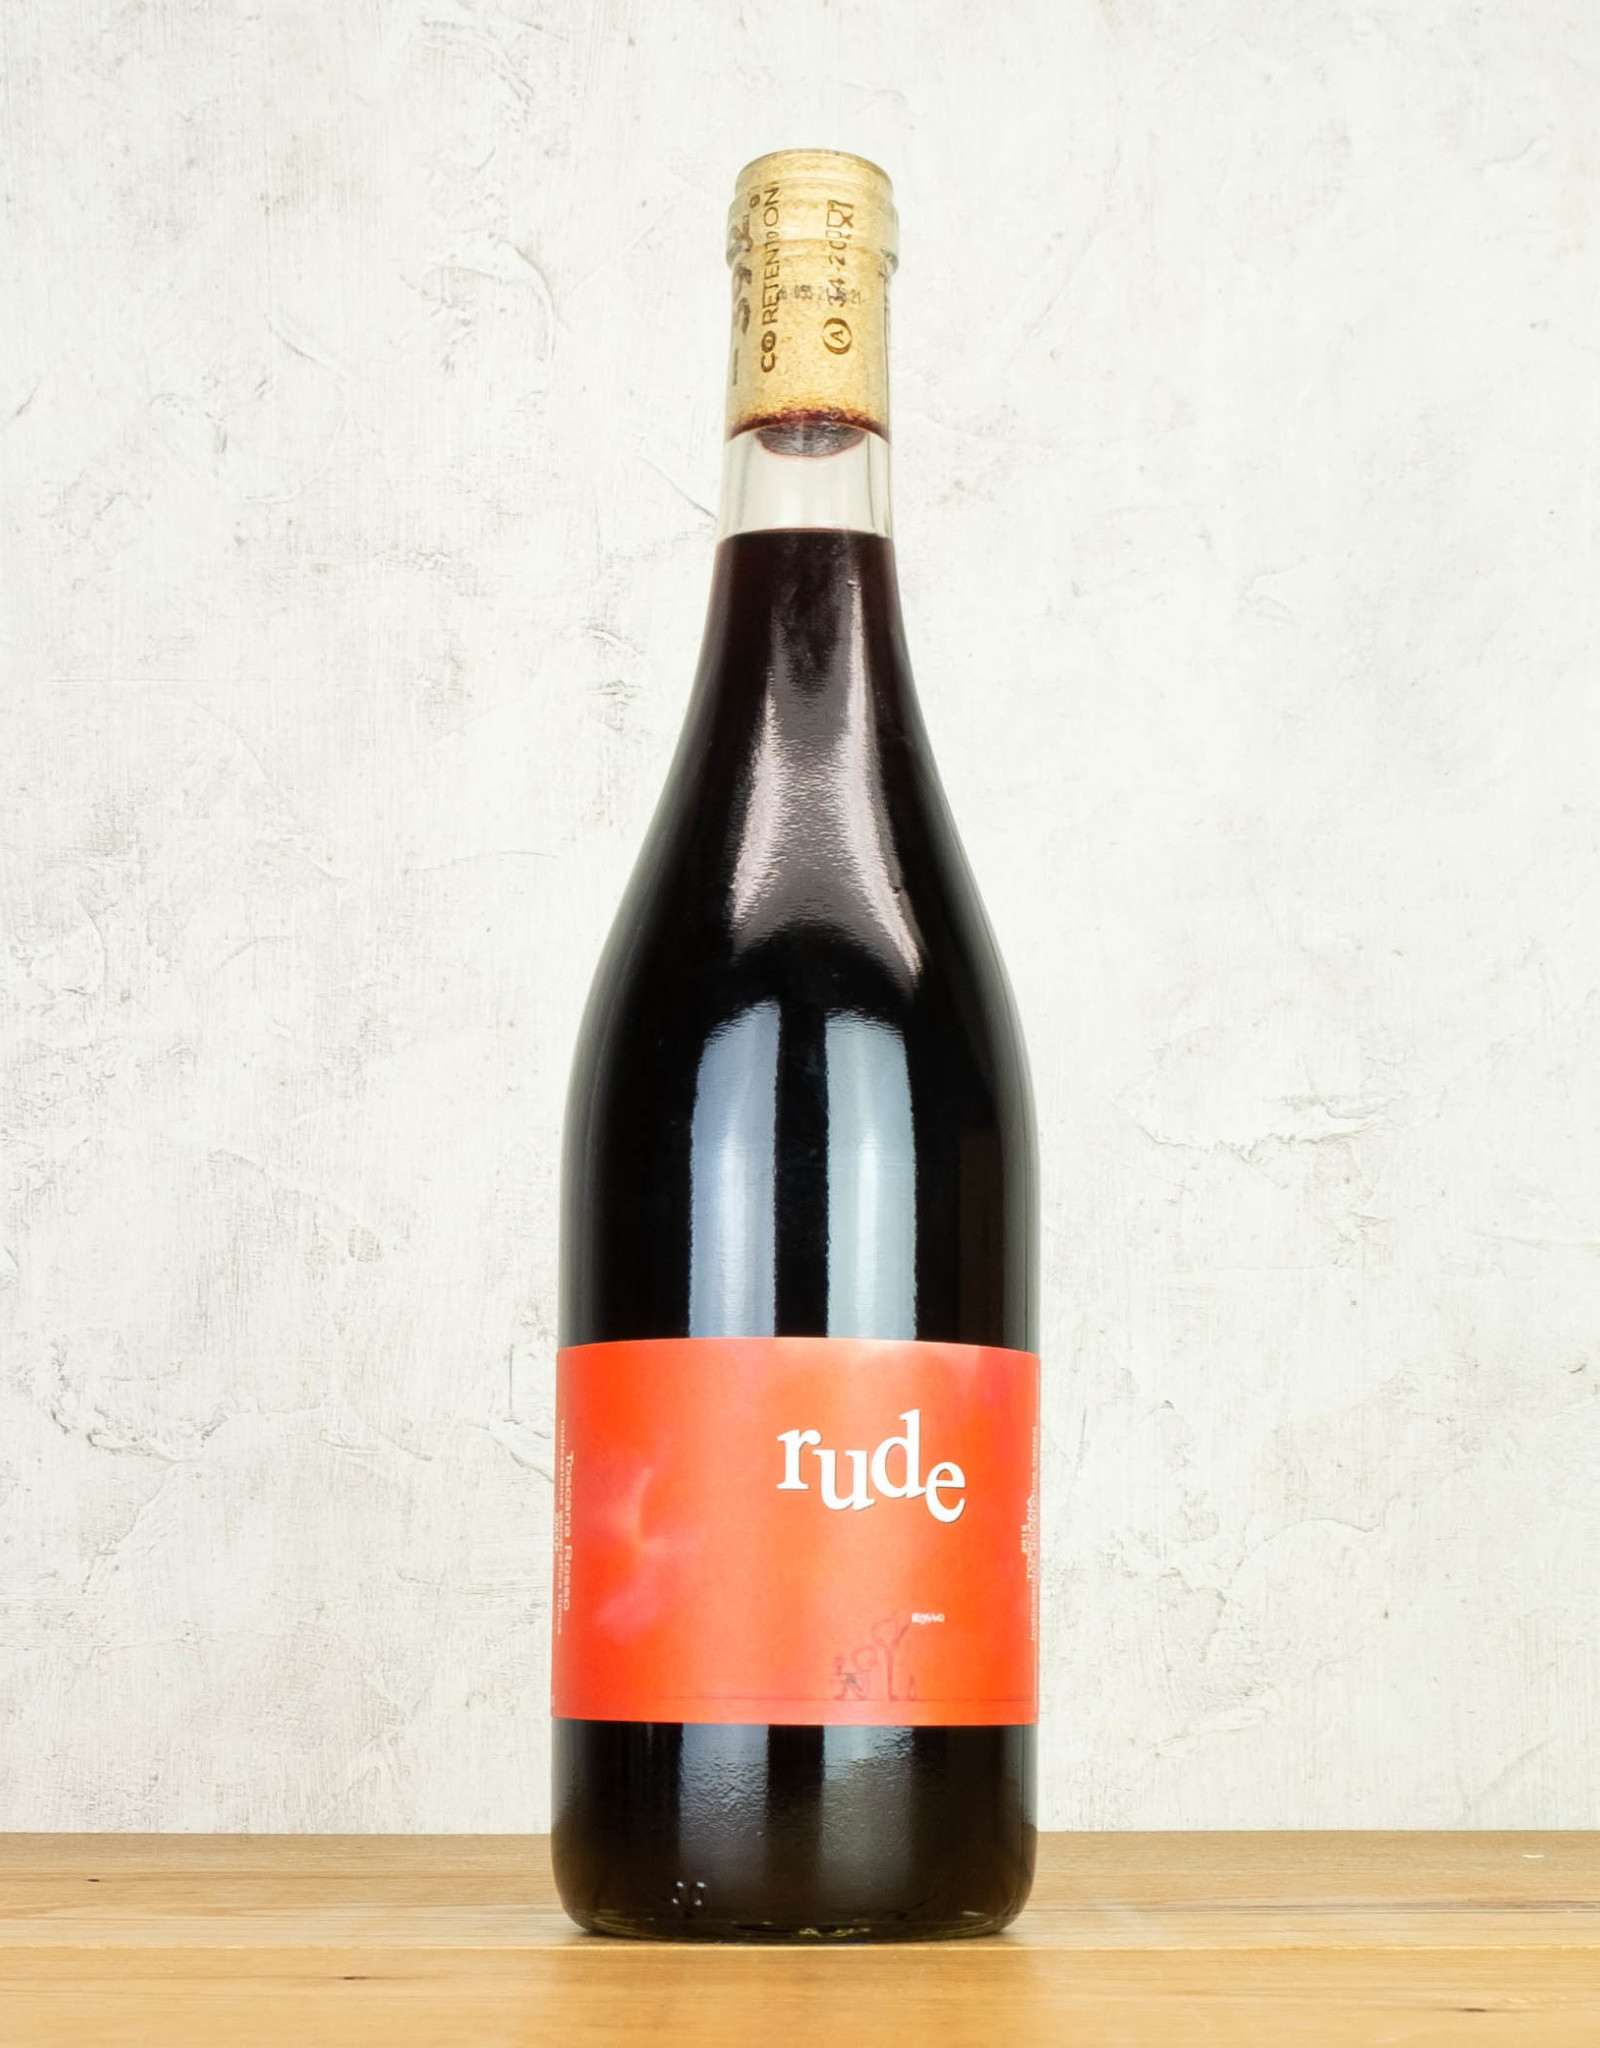 Tanganelli Rude Rosso